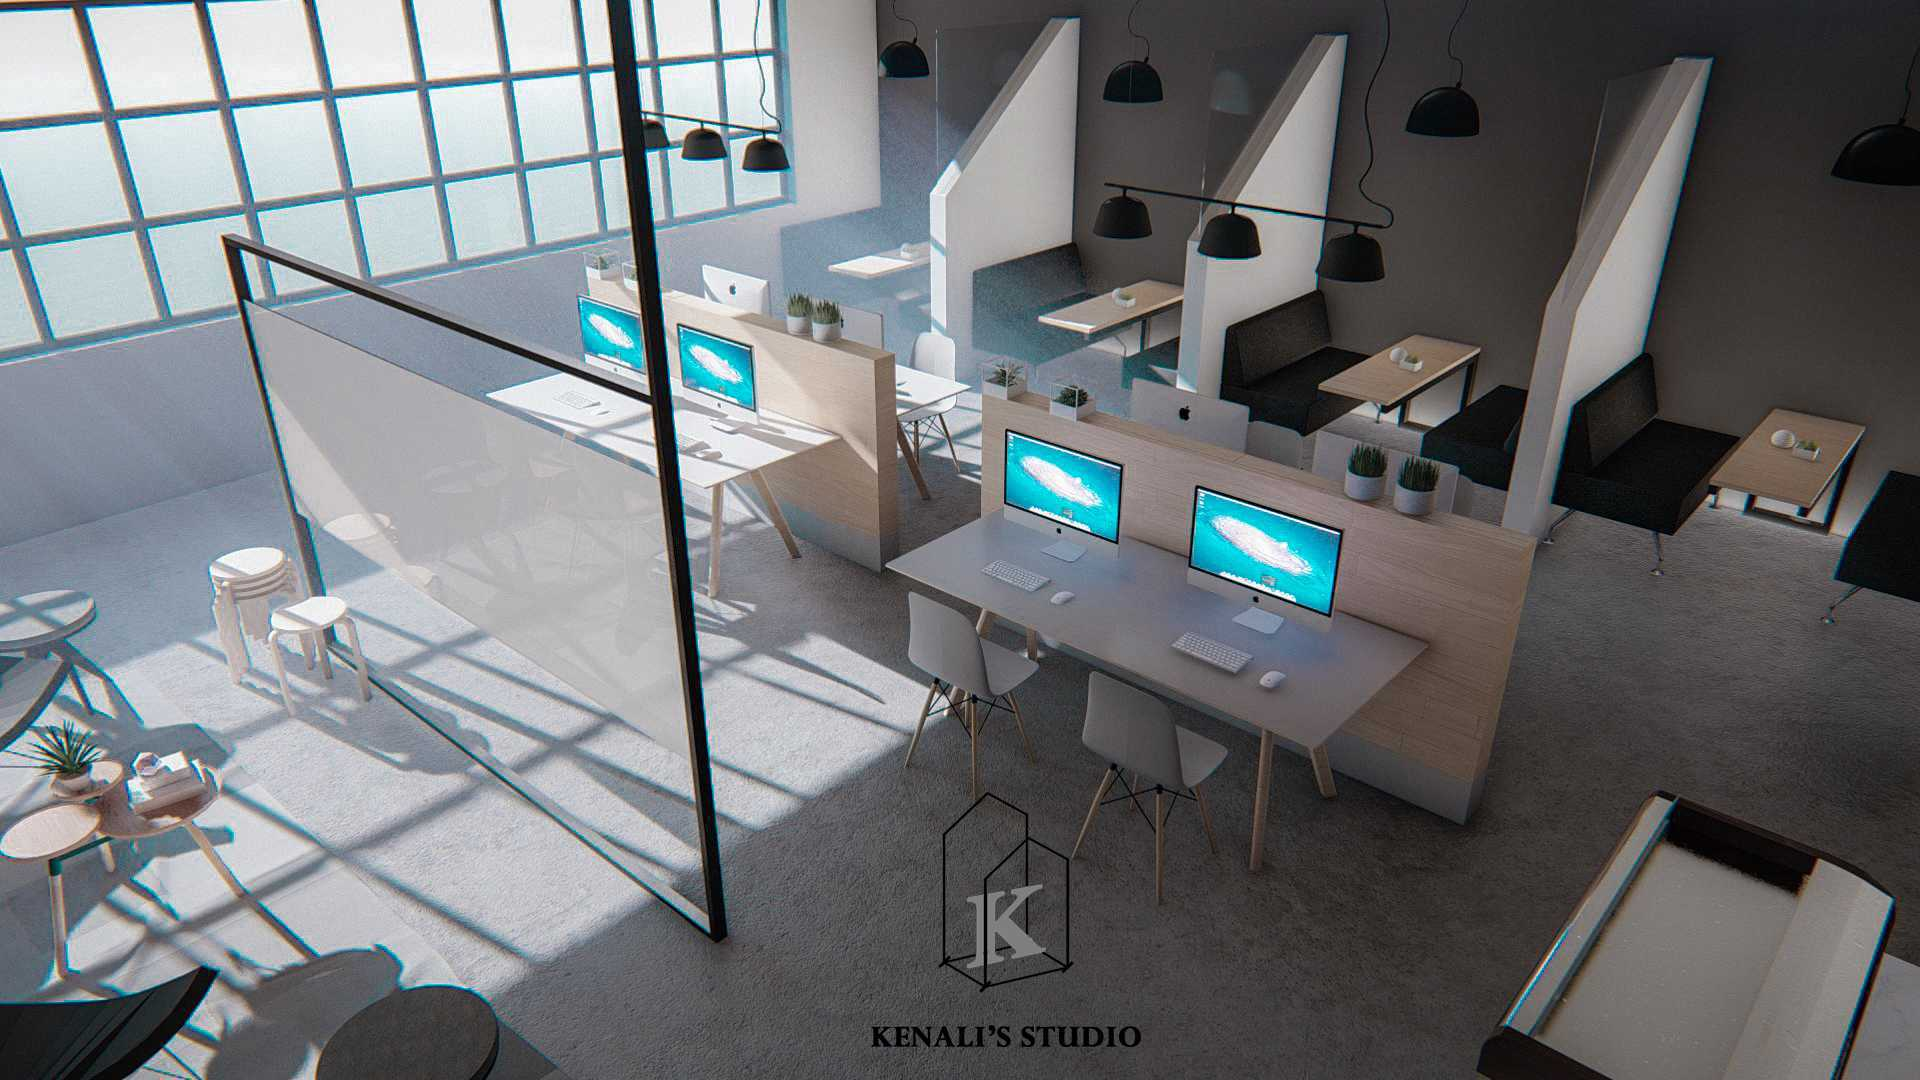 Kenali's Studio Co-Working Space Surabaya, Kota Sby, Jawa Timur, Indonesia Surabaya, Kota Sby, Jawa Timur, Indonesia Kenalis-Studio-Co-Working-Space   93662